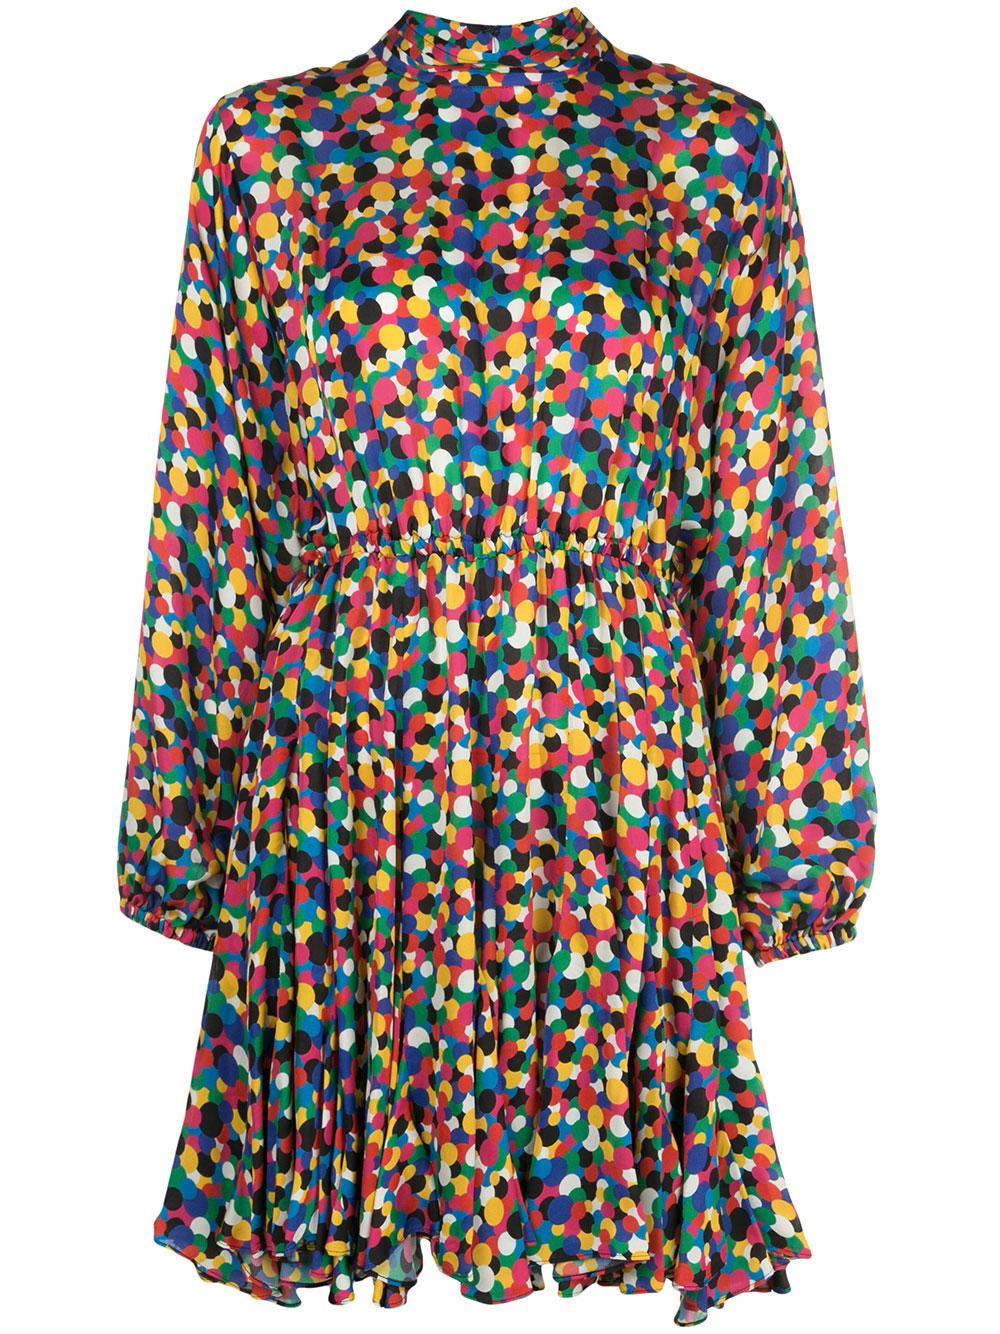 Caroline Confetti Dress Item # H19DR07GGP